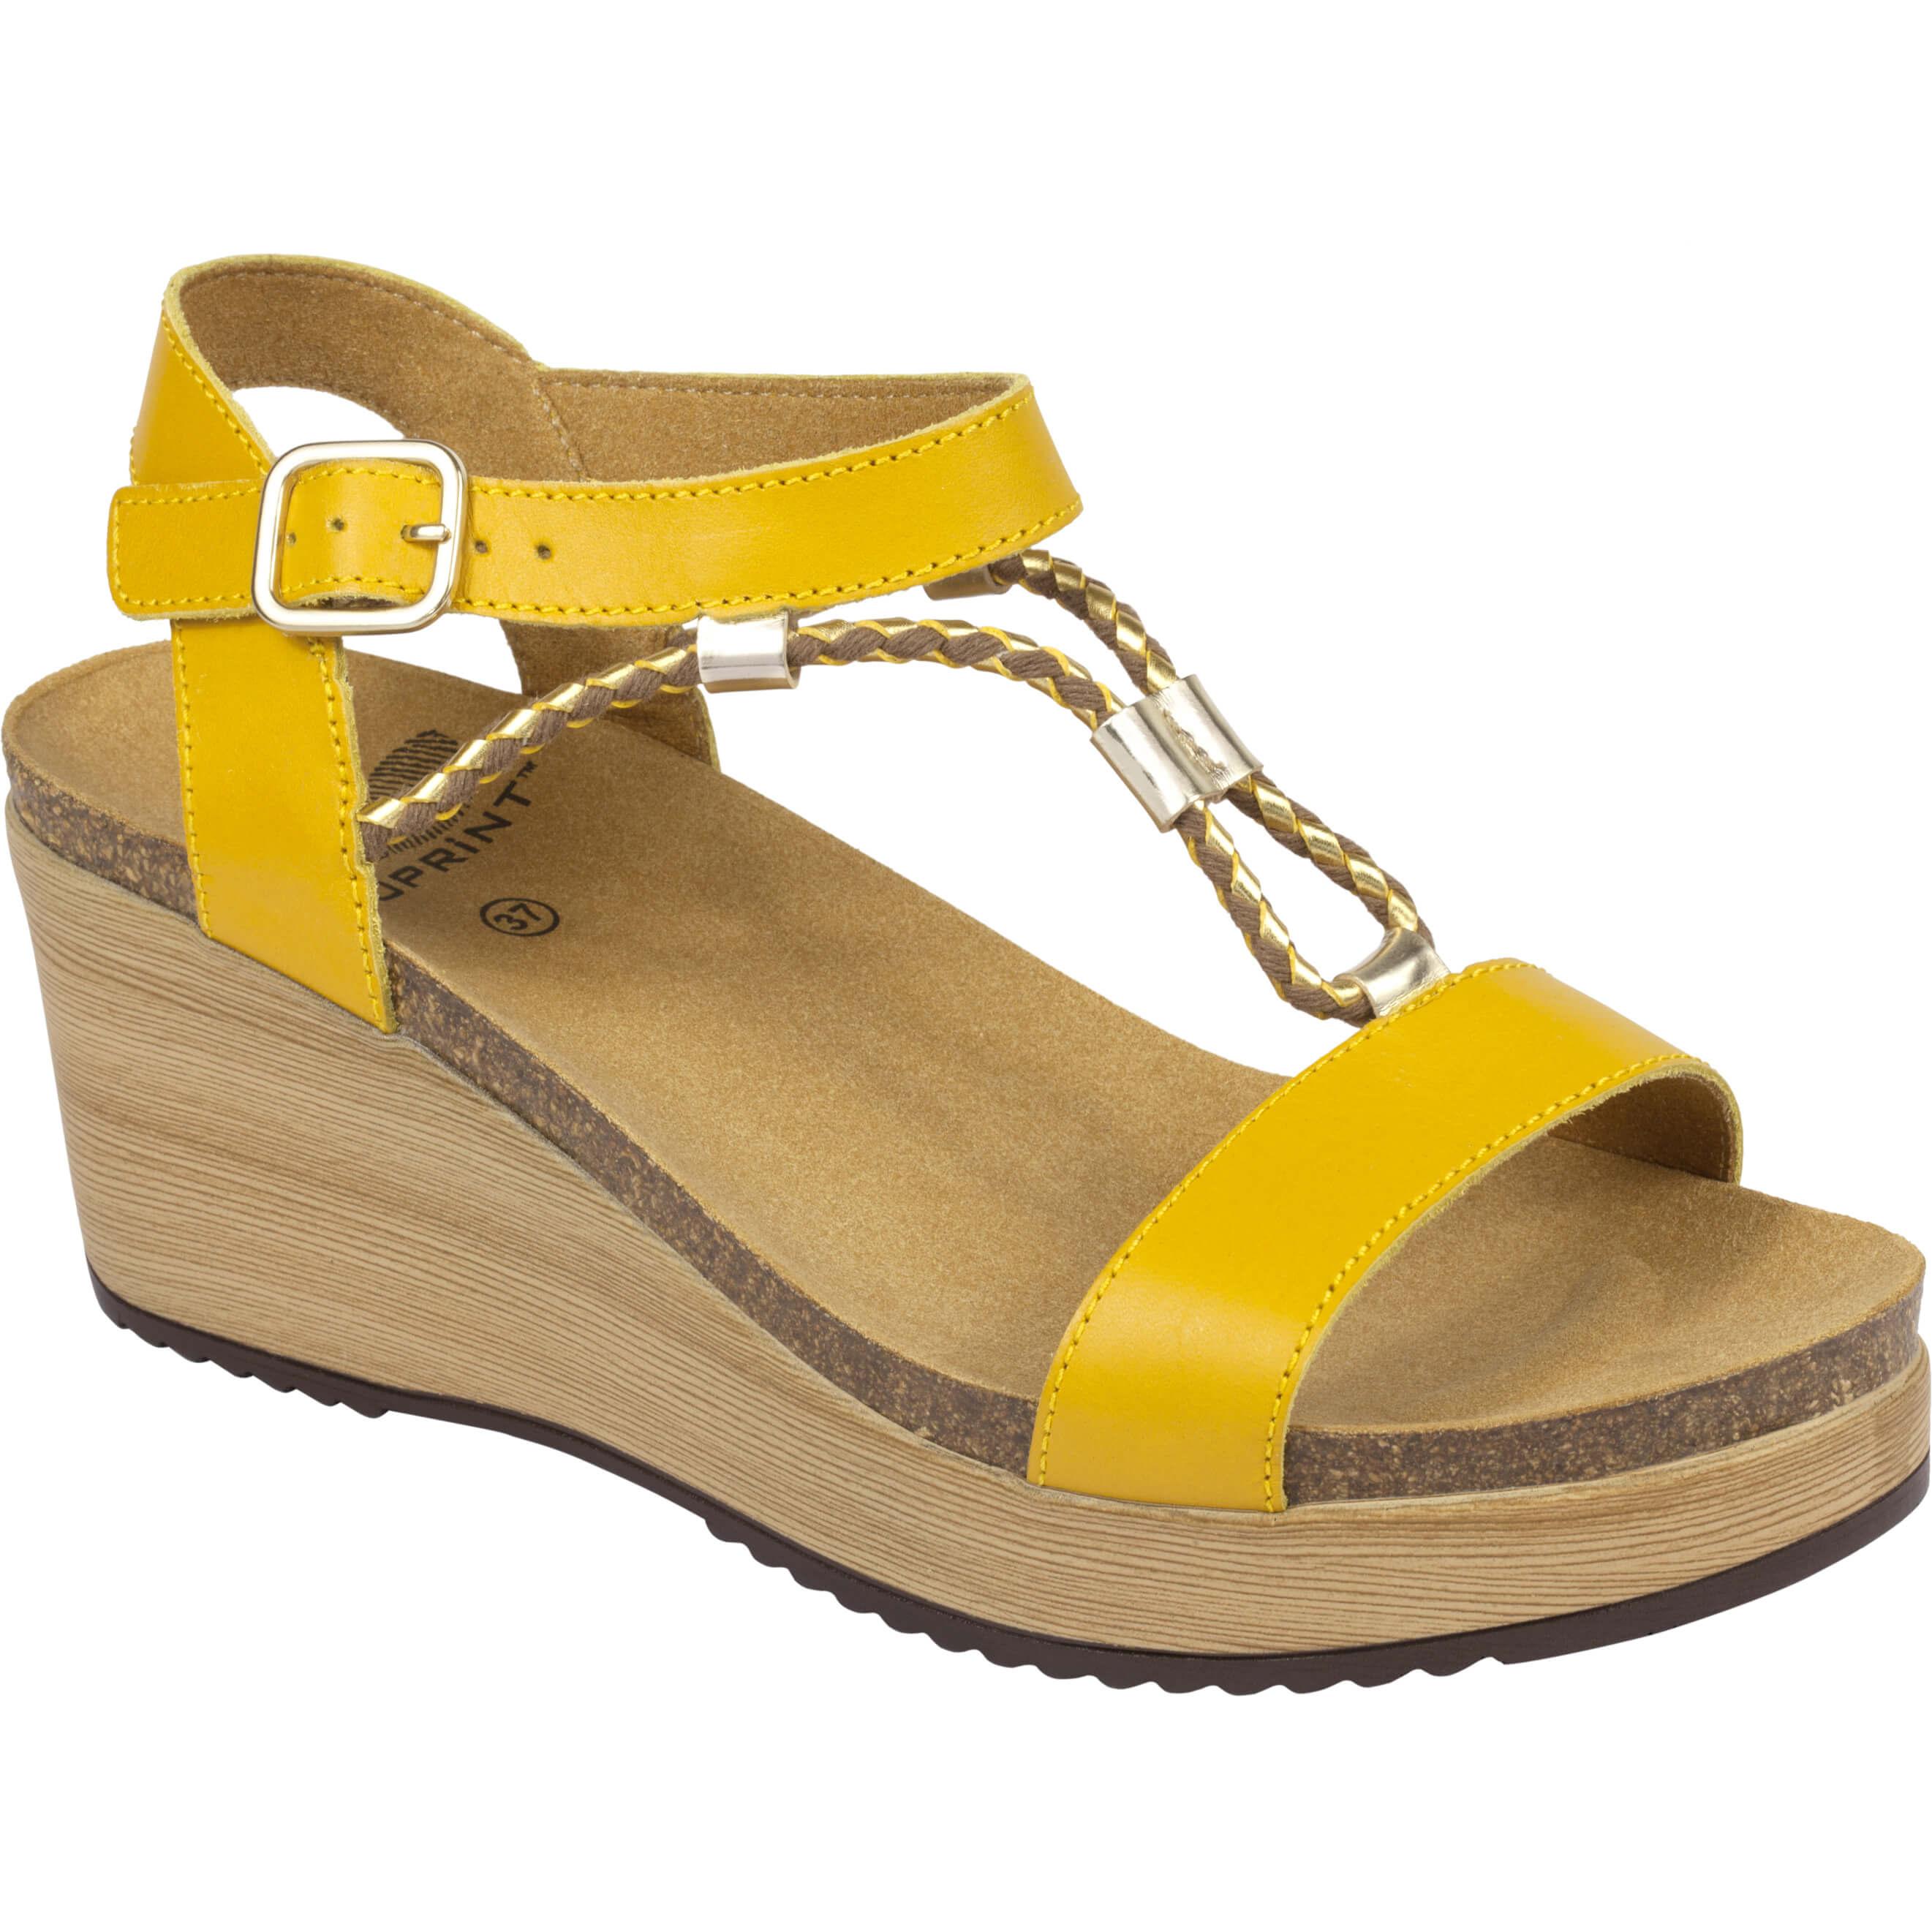 990857428b6 Dr Scholl Shoes Blanche Ώχρα NEO Γυναικεία Ανατομικά Παπούτσια Χαρίζουν  Σωστή Στάση & Φυσικό Χωρίς Πόνο